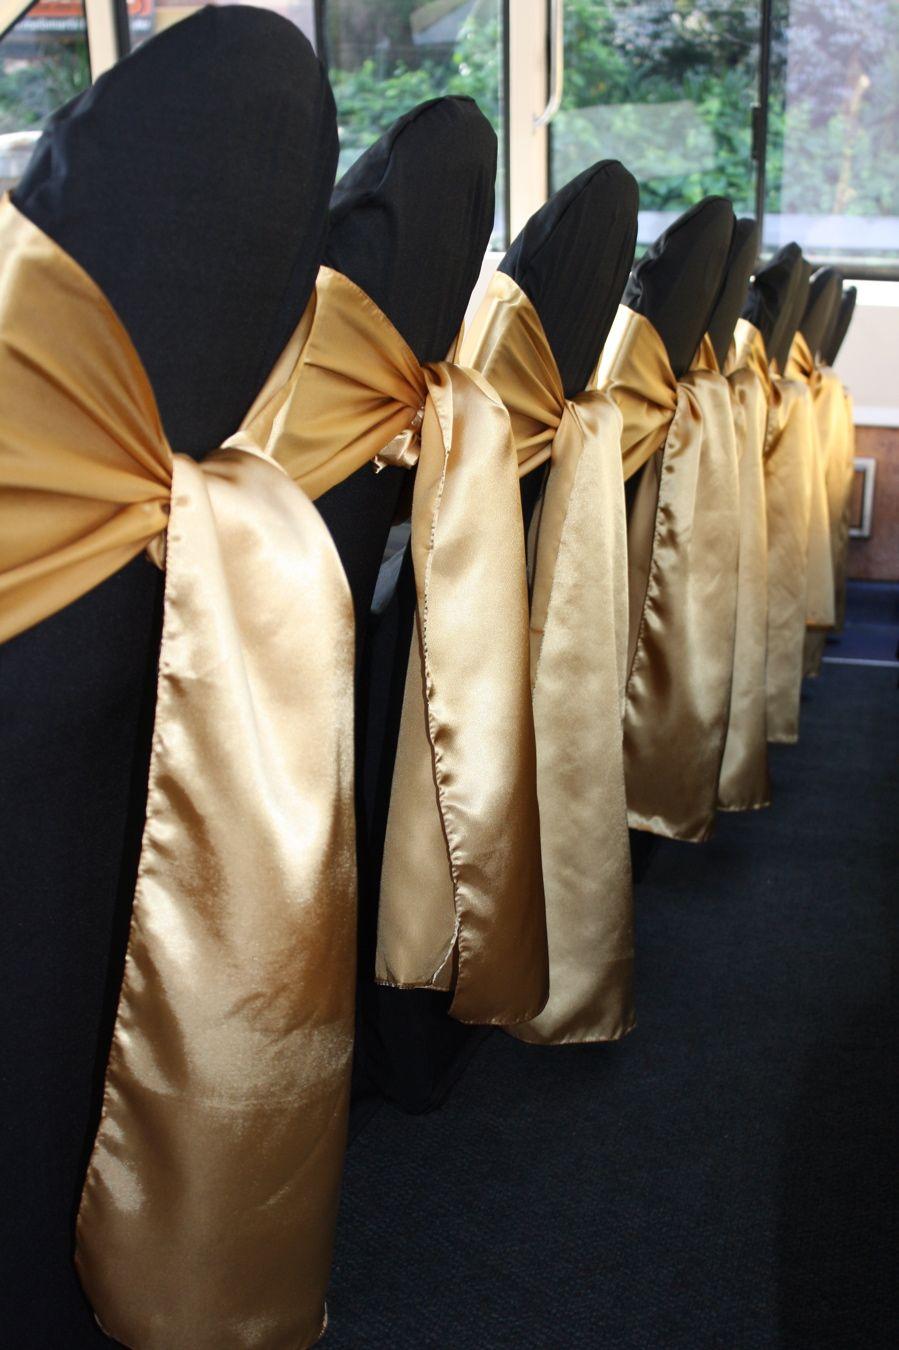 20 creative diy wedding chair ideas with satin sash gold